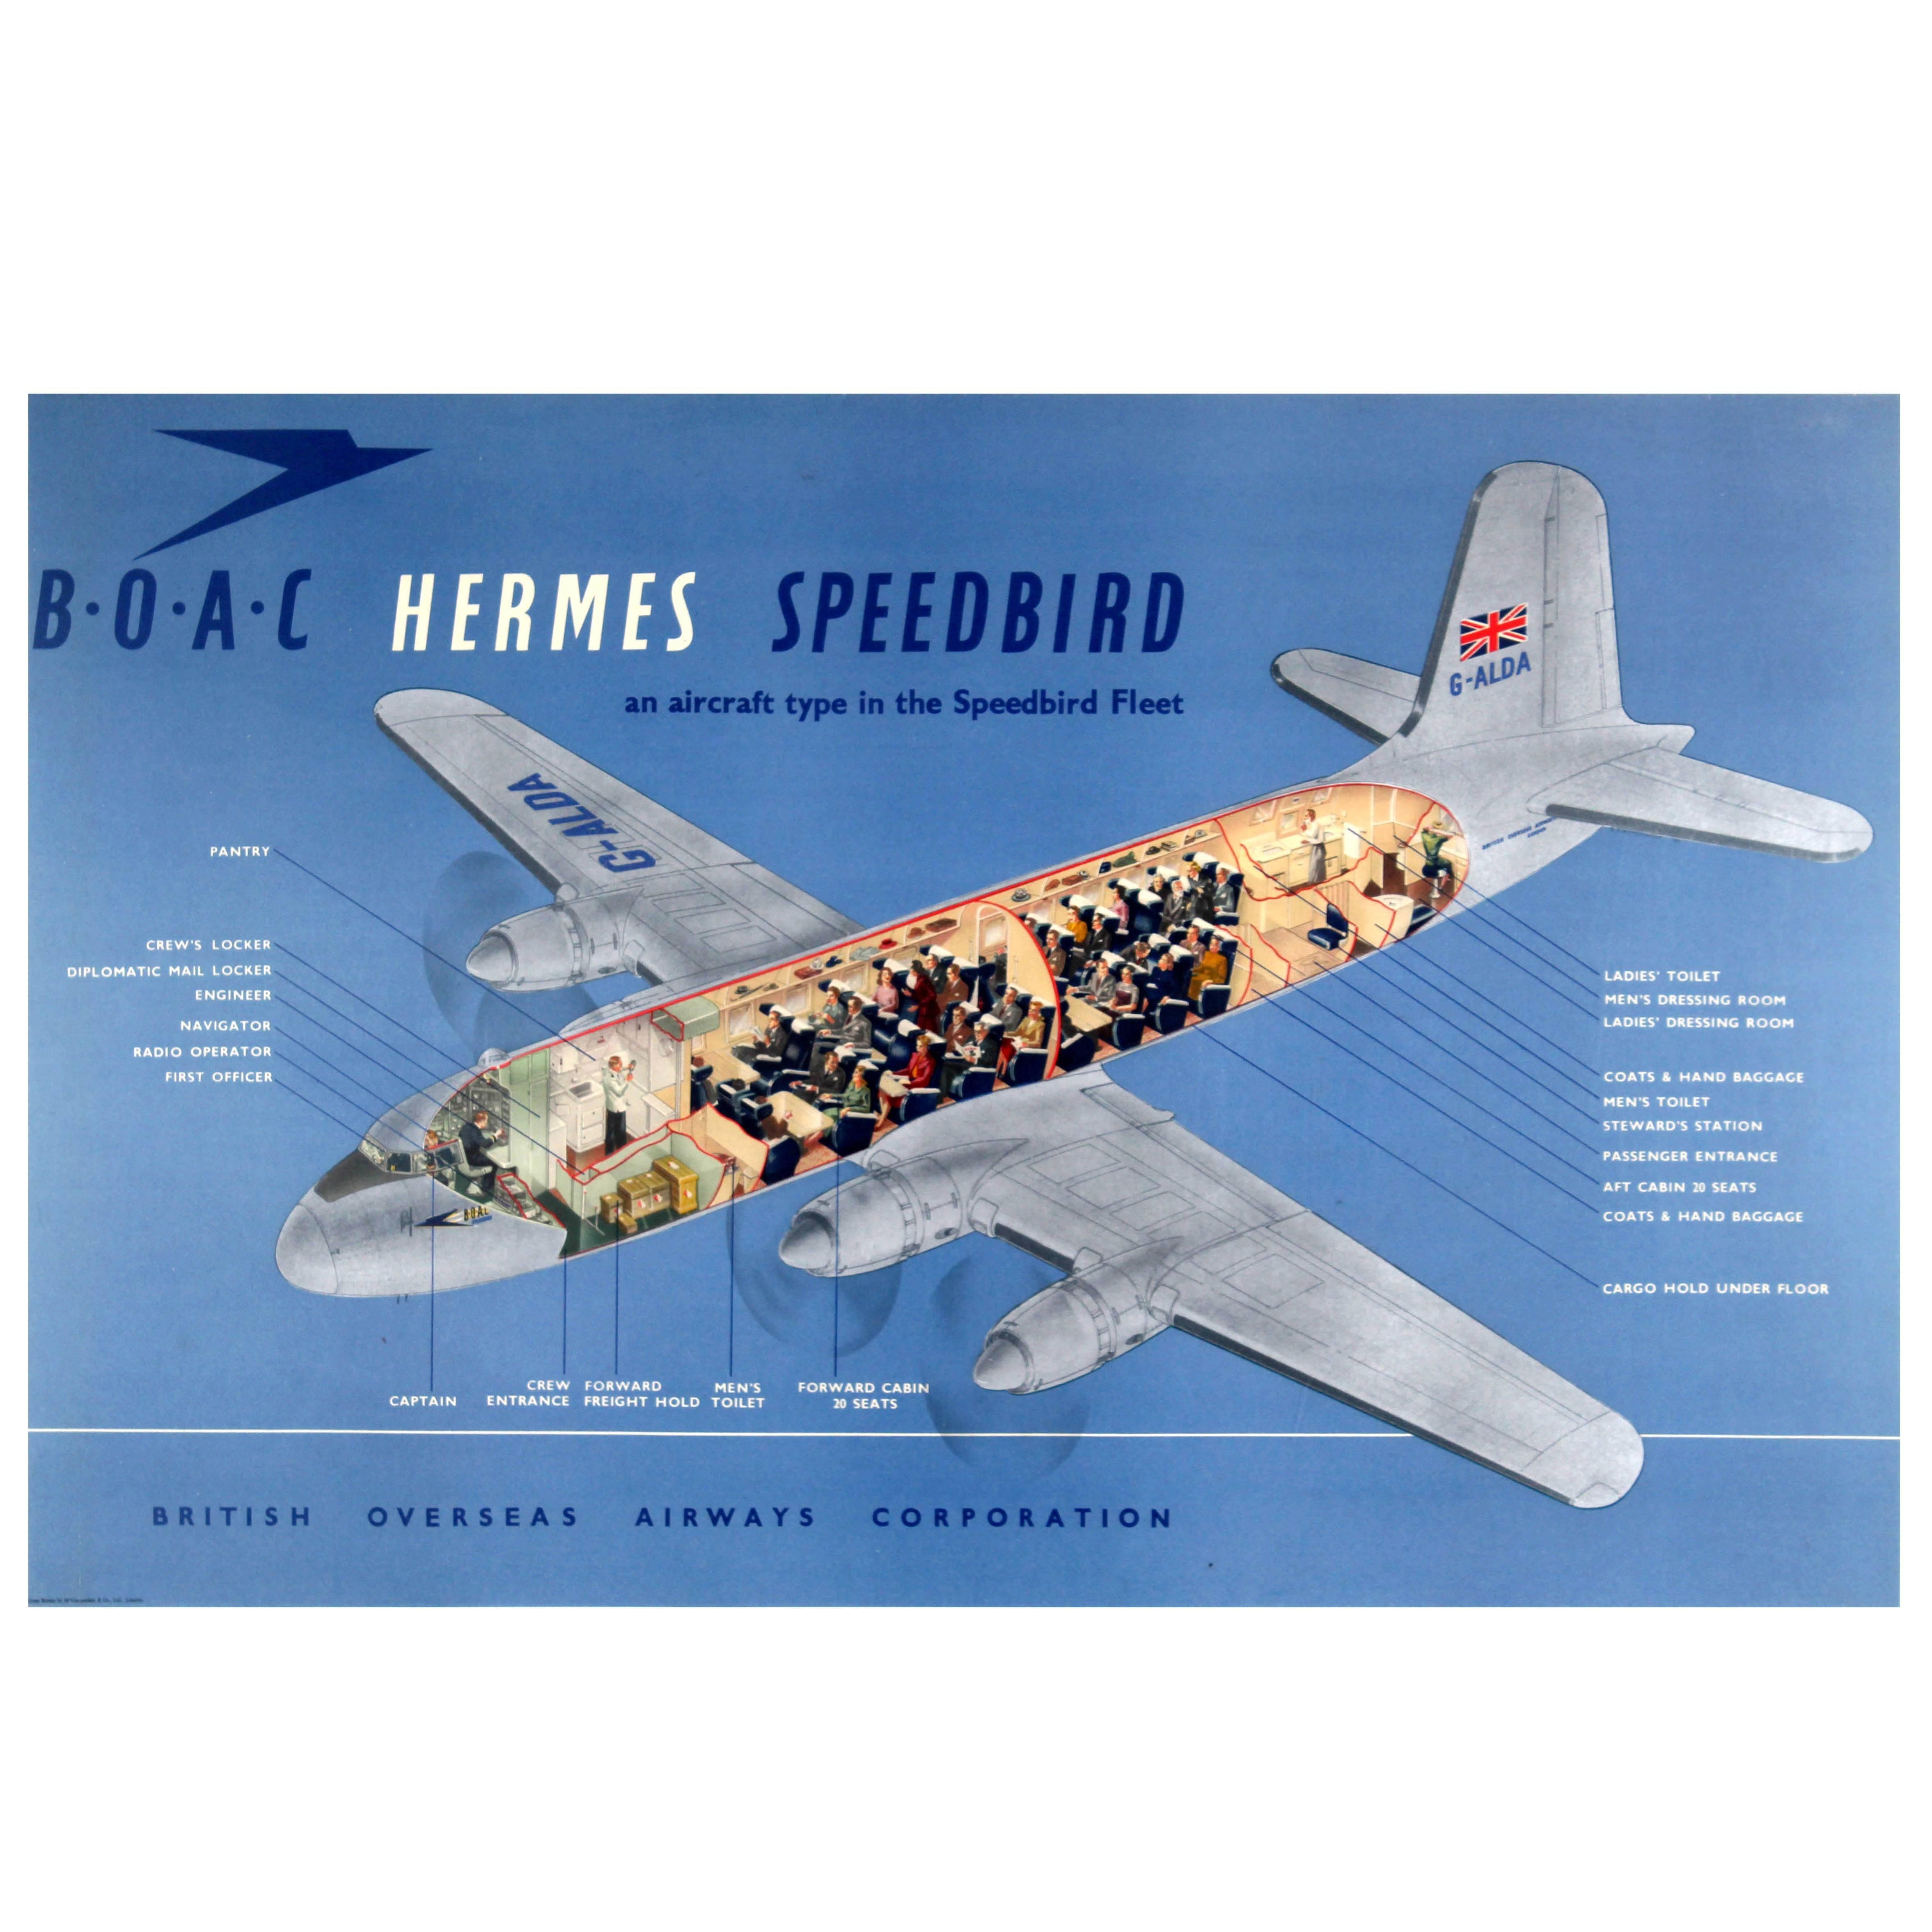 Original Vintage Travel Advertising Poster BOAC Hermes Speedbird Aircraft Fleet